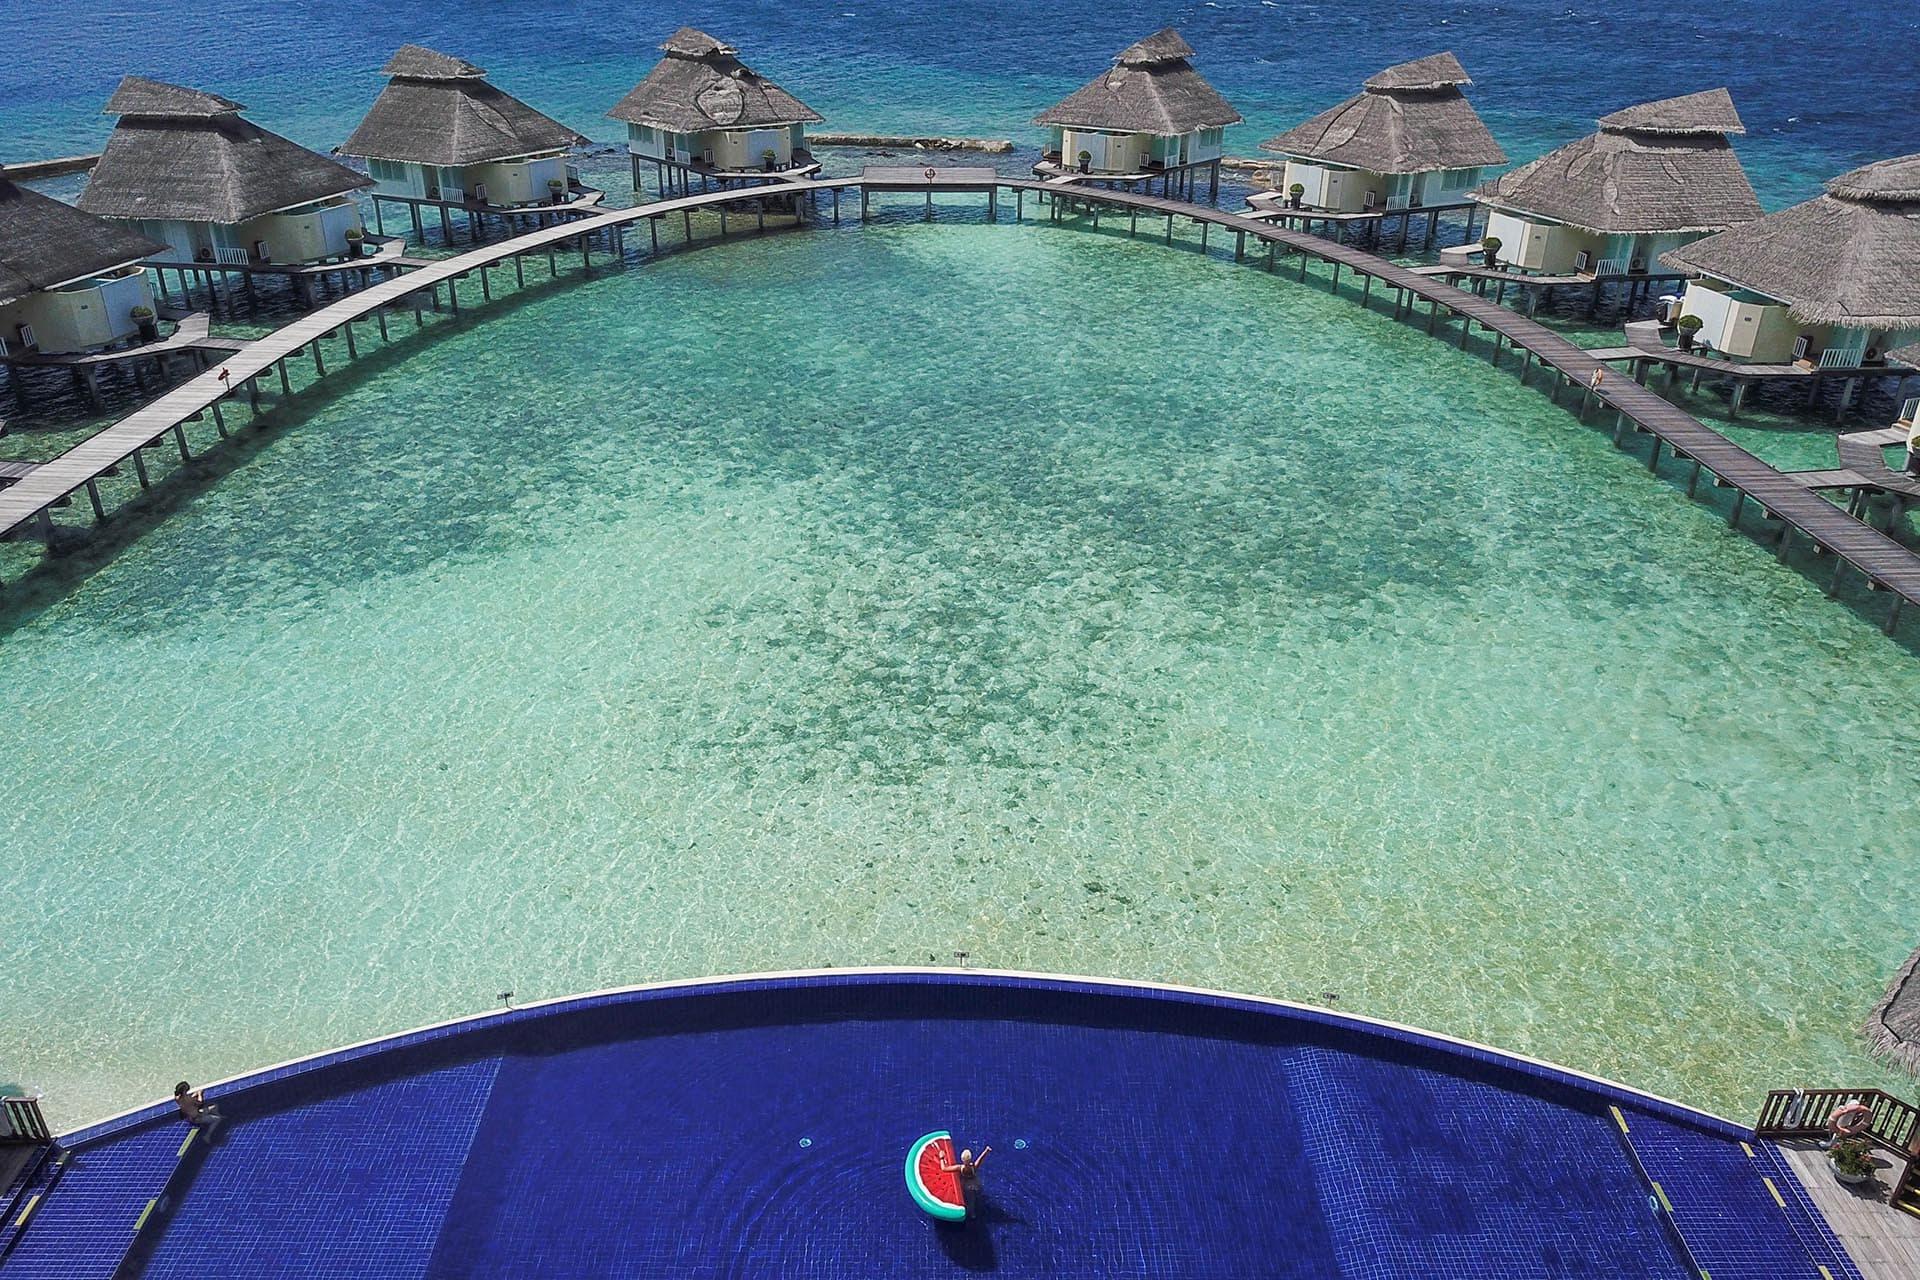 Maldives Resort vs Maldives Local Islands